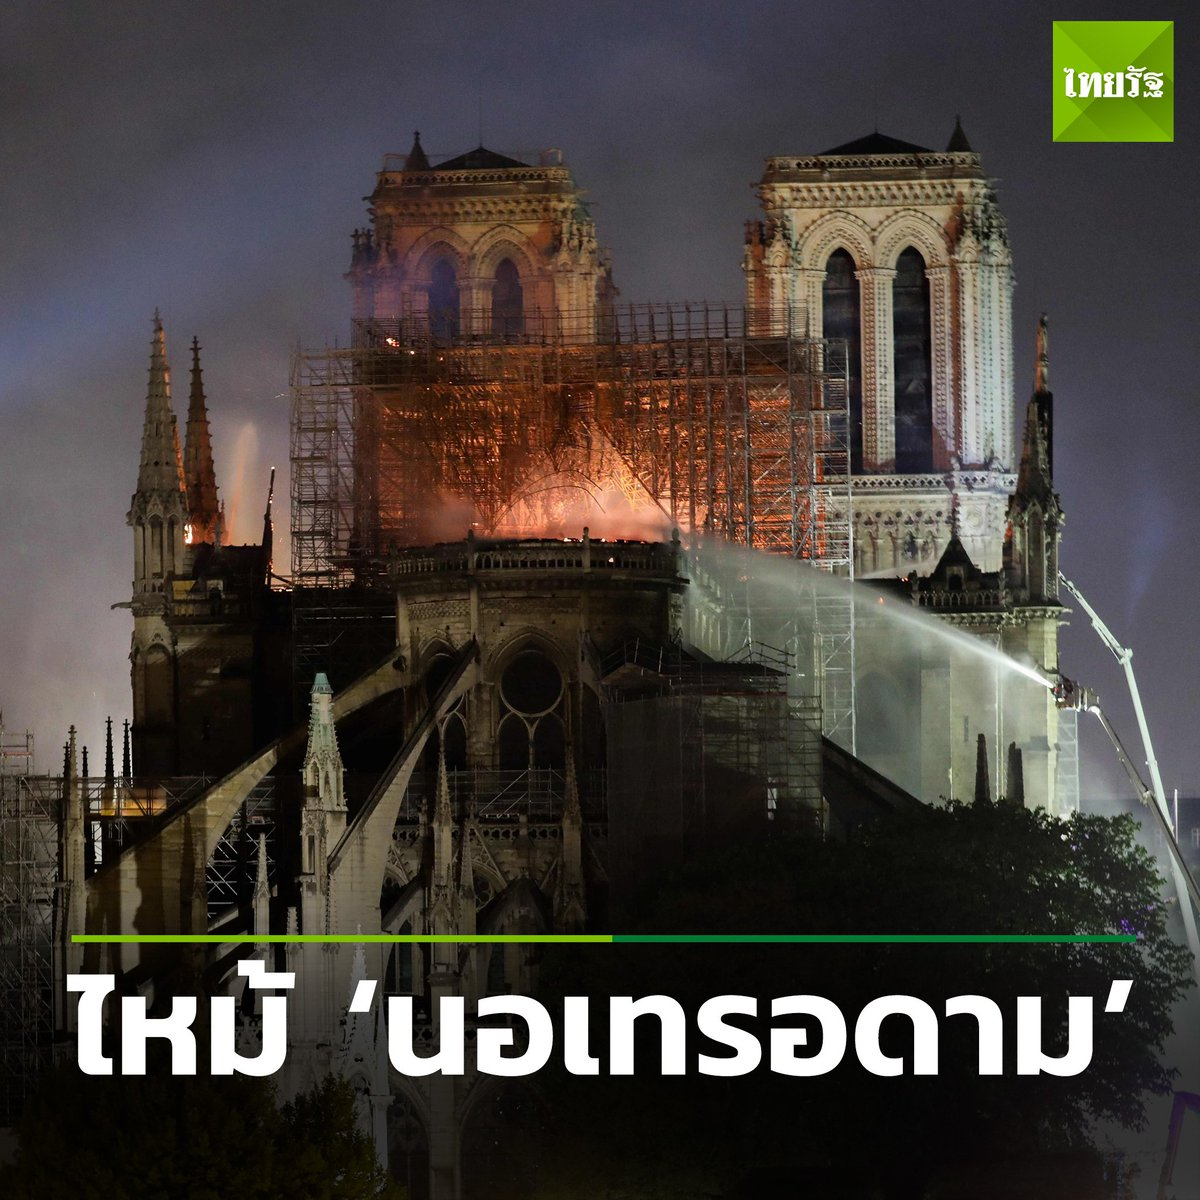 Thairath_News's photo on #PrayForNotreDame